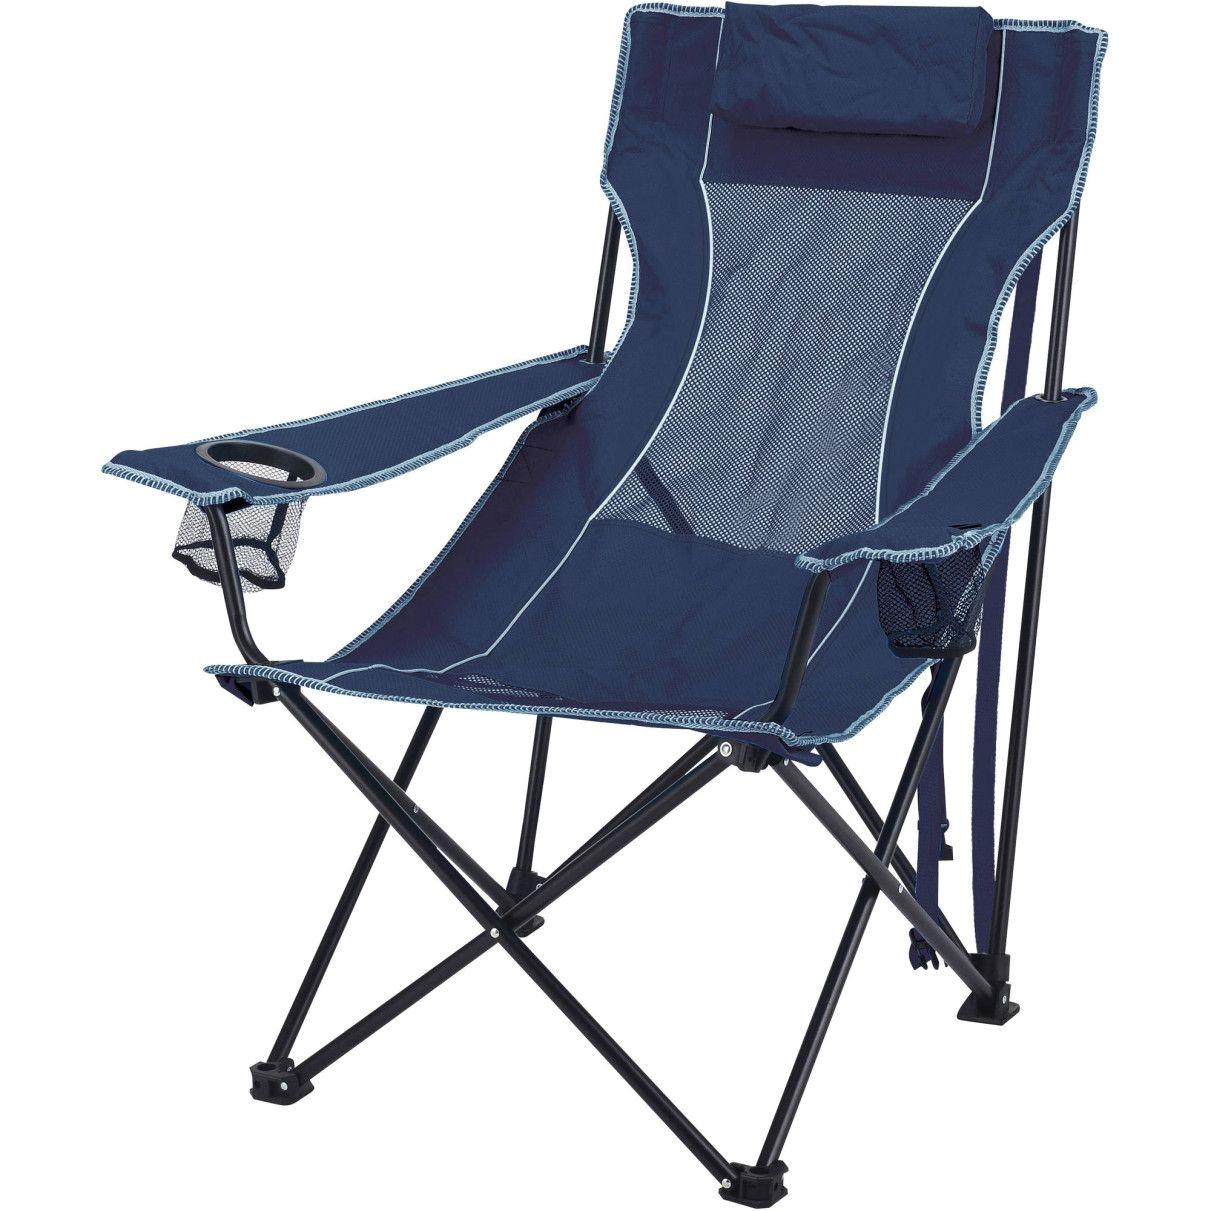 Directors Chair Walmart Canada Camping Chairs at Walmart Home Office Furniture Set Check More at